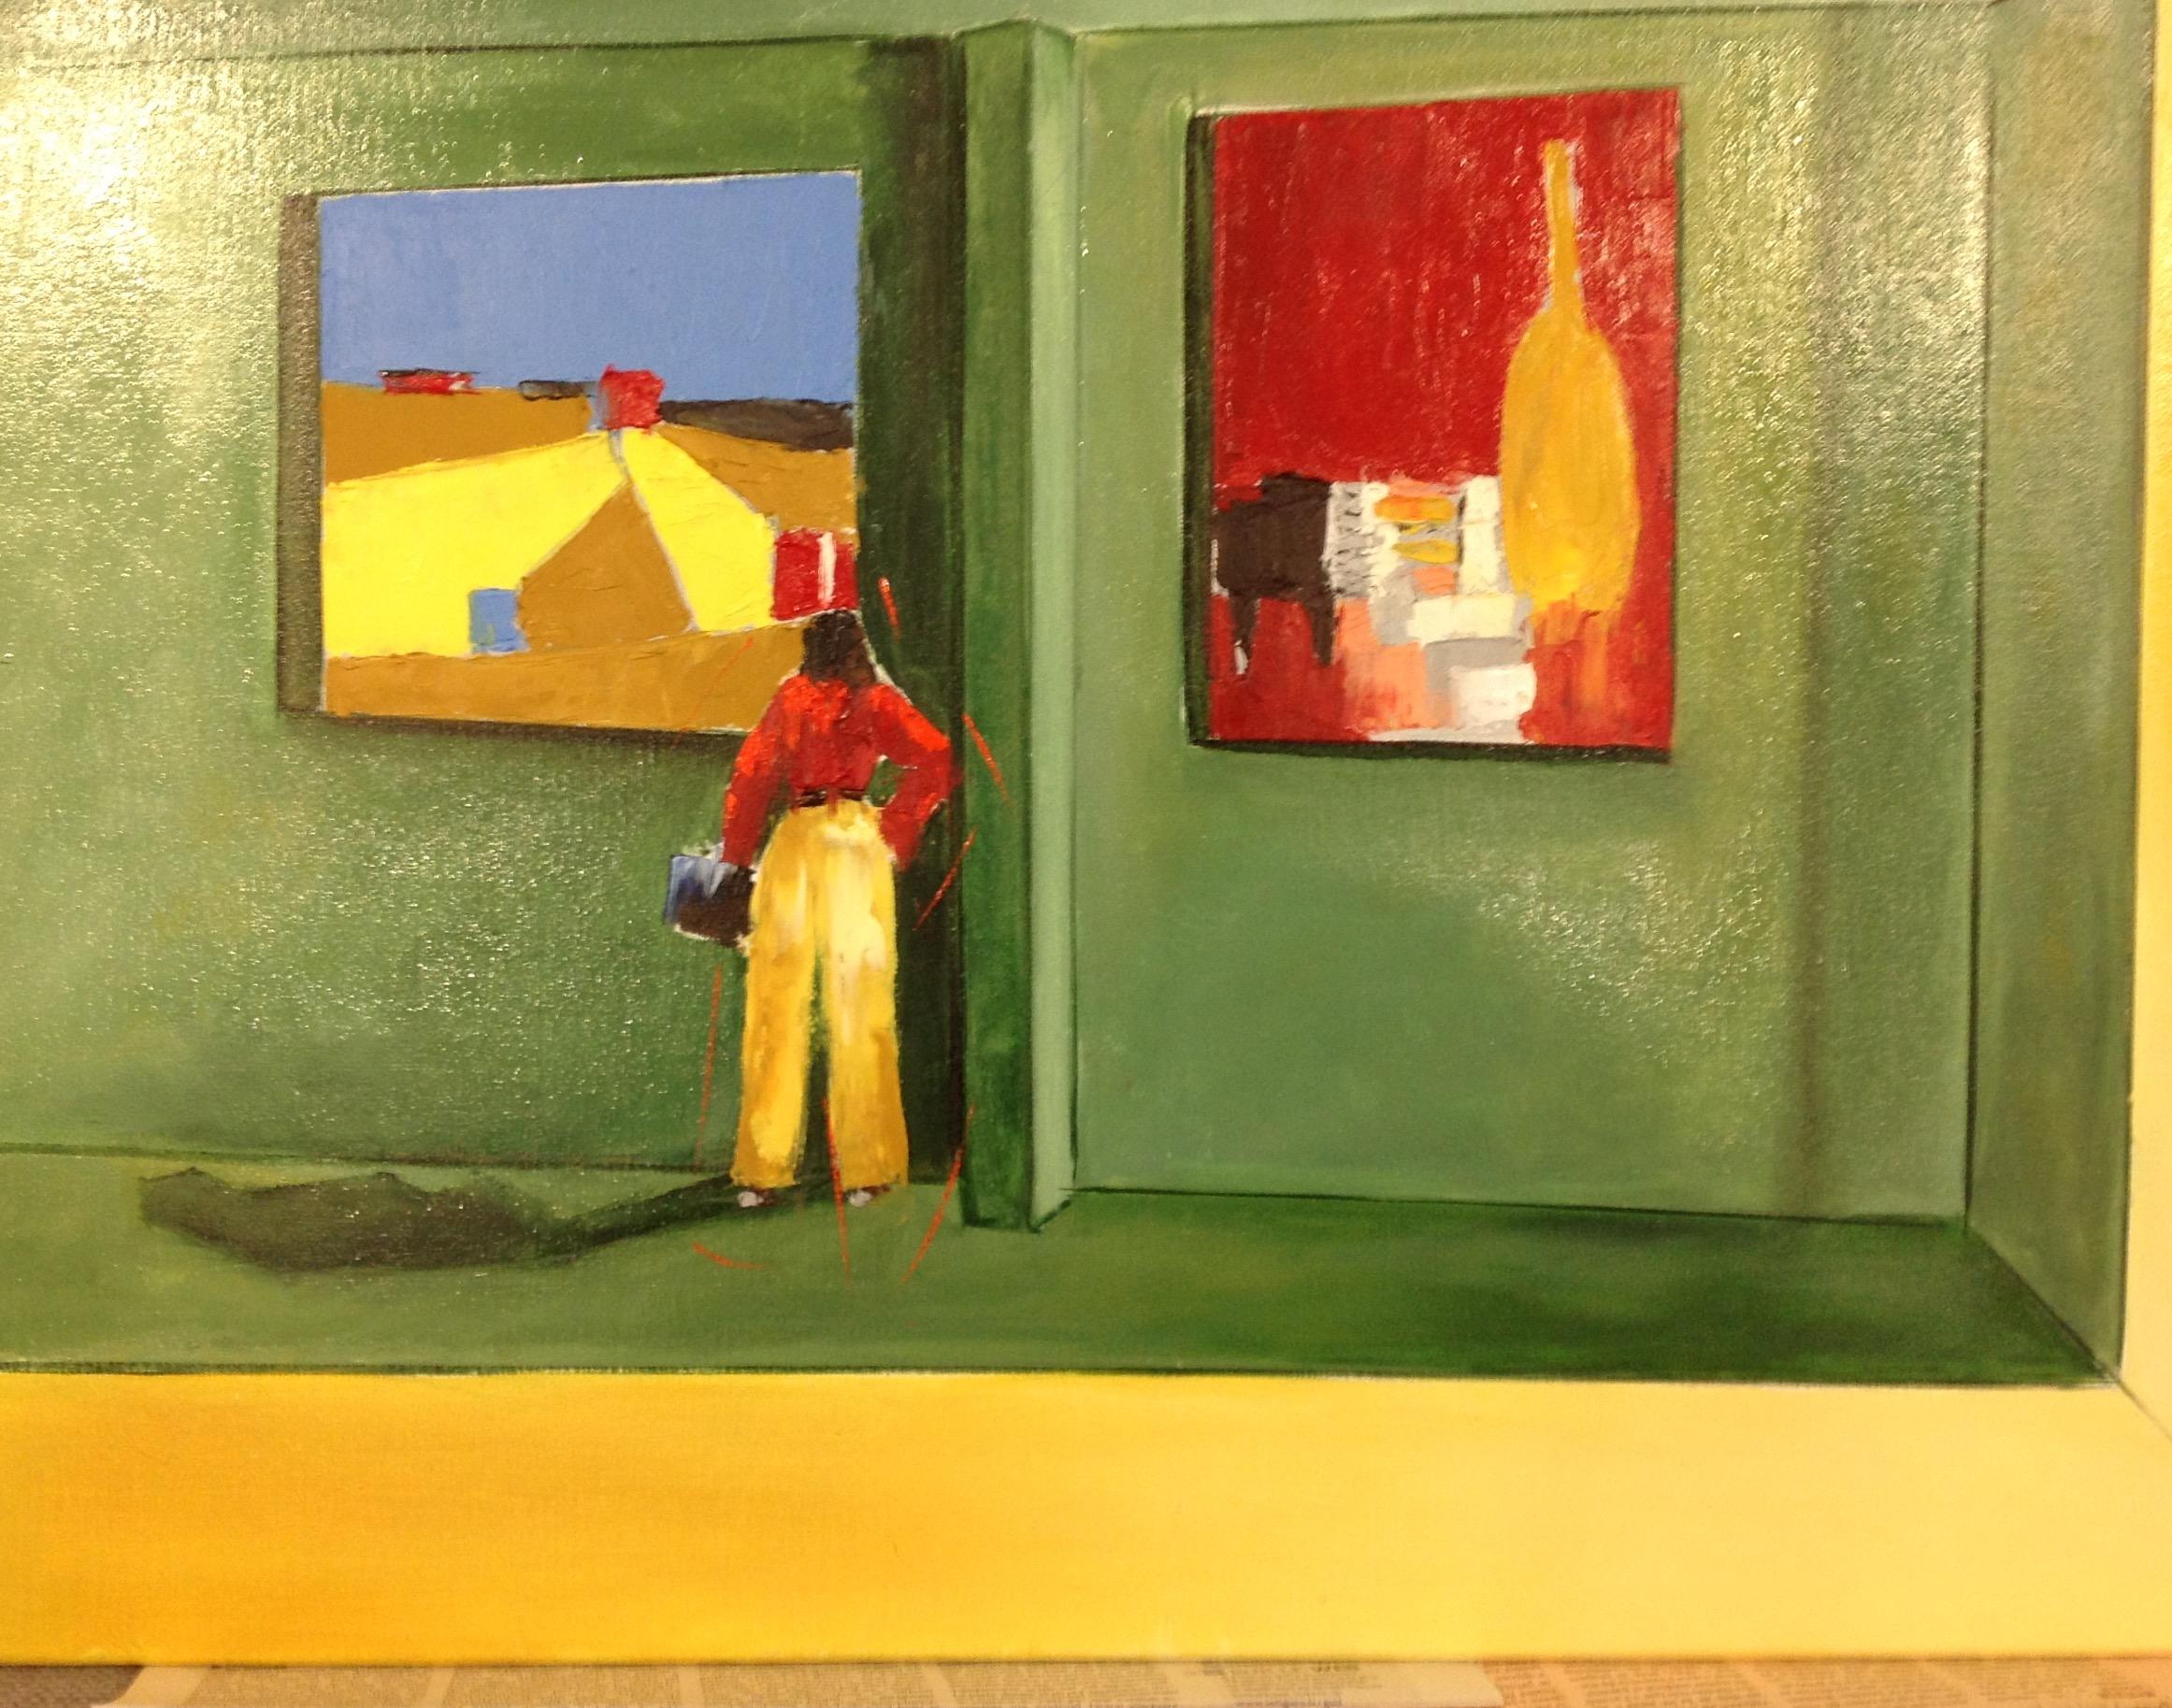 Hopper versus Staël